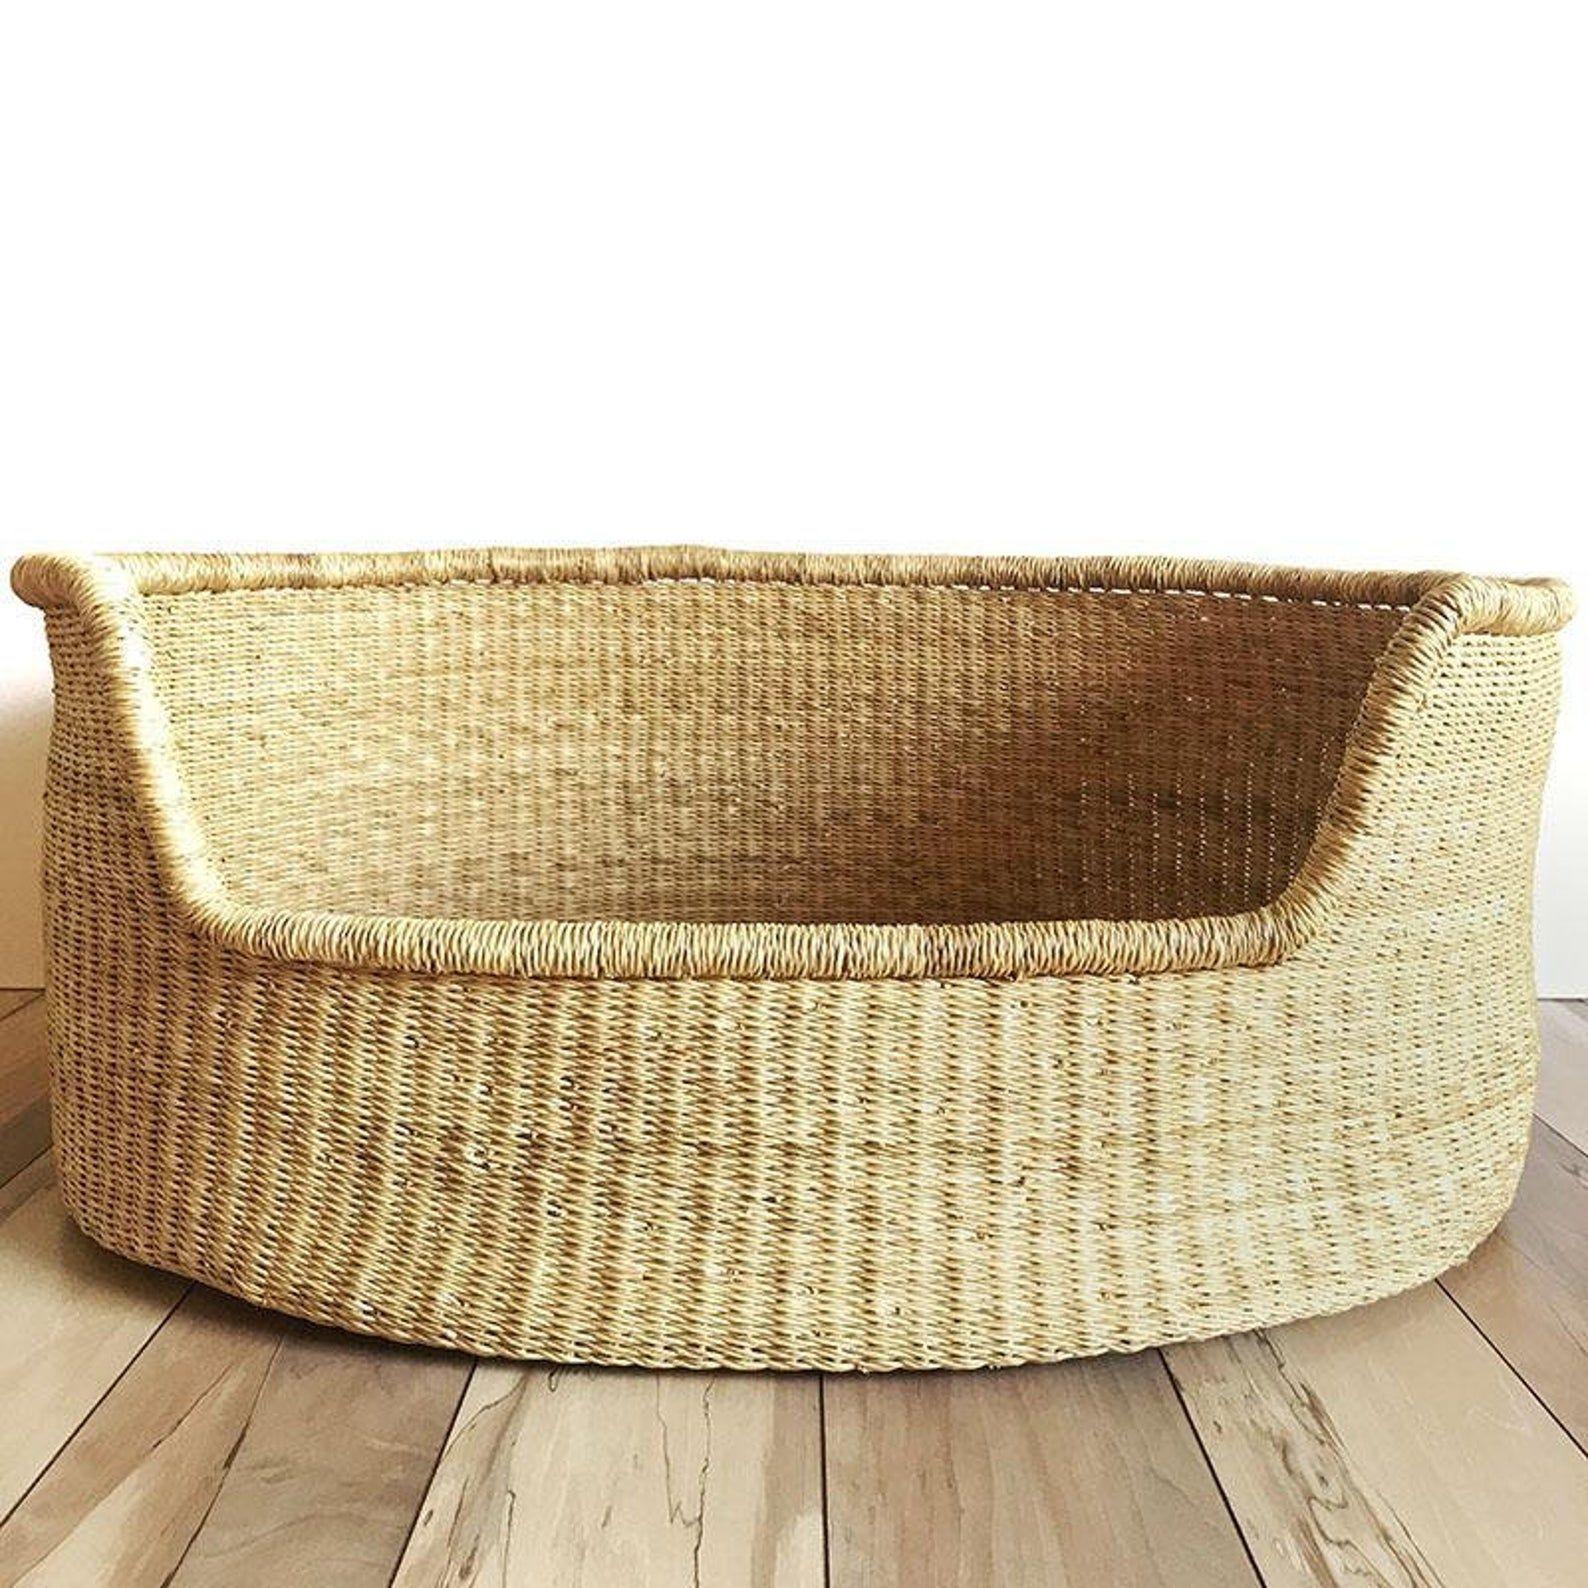 Large Bolga Dog Basket African Dog Bed Handmade Dog Bed Comfortable Dog Bed Wicker Dog Bed Dog Bed Basket Dog Bed Wicker Dog Bed Dog Basket